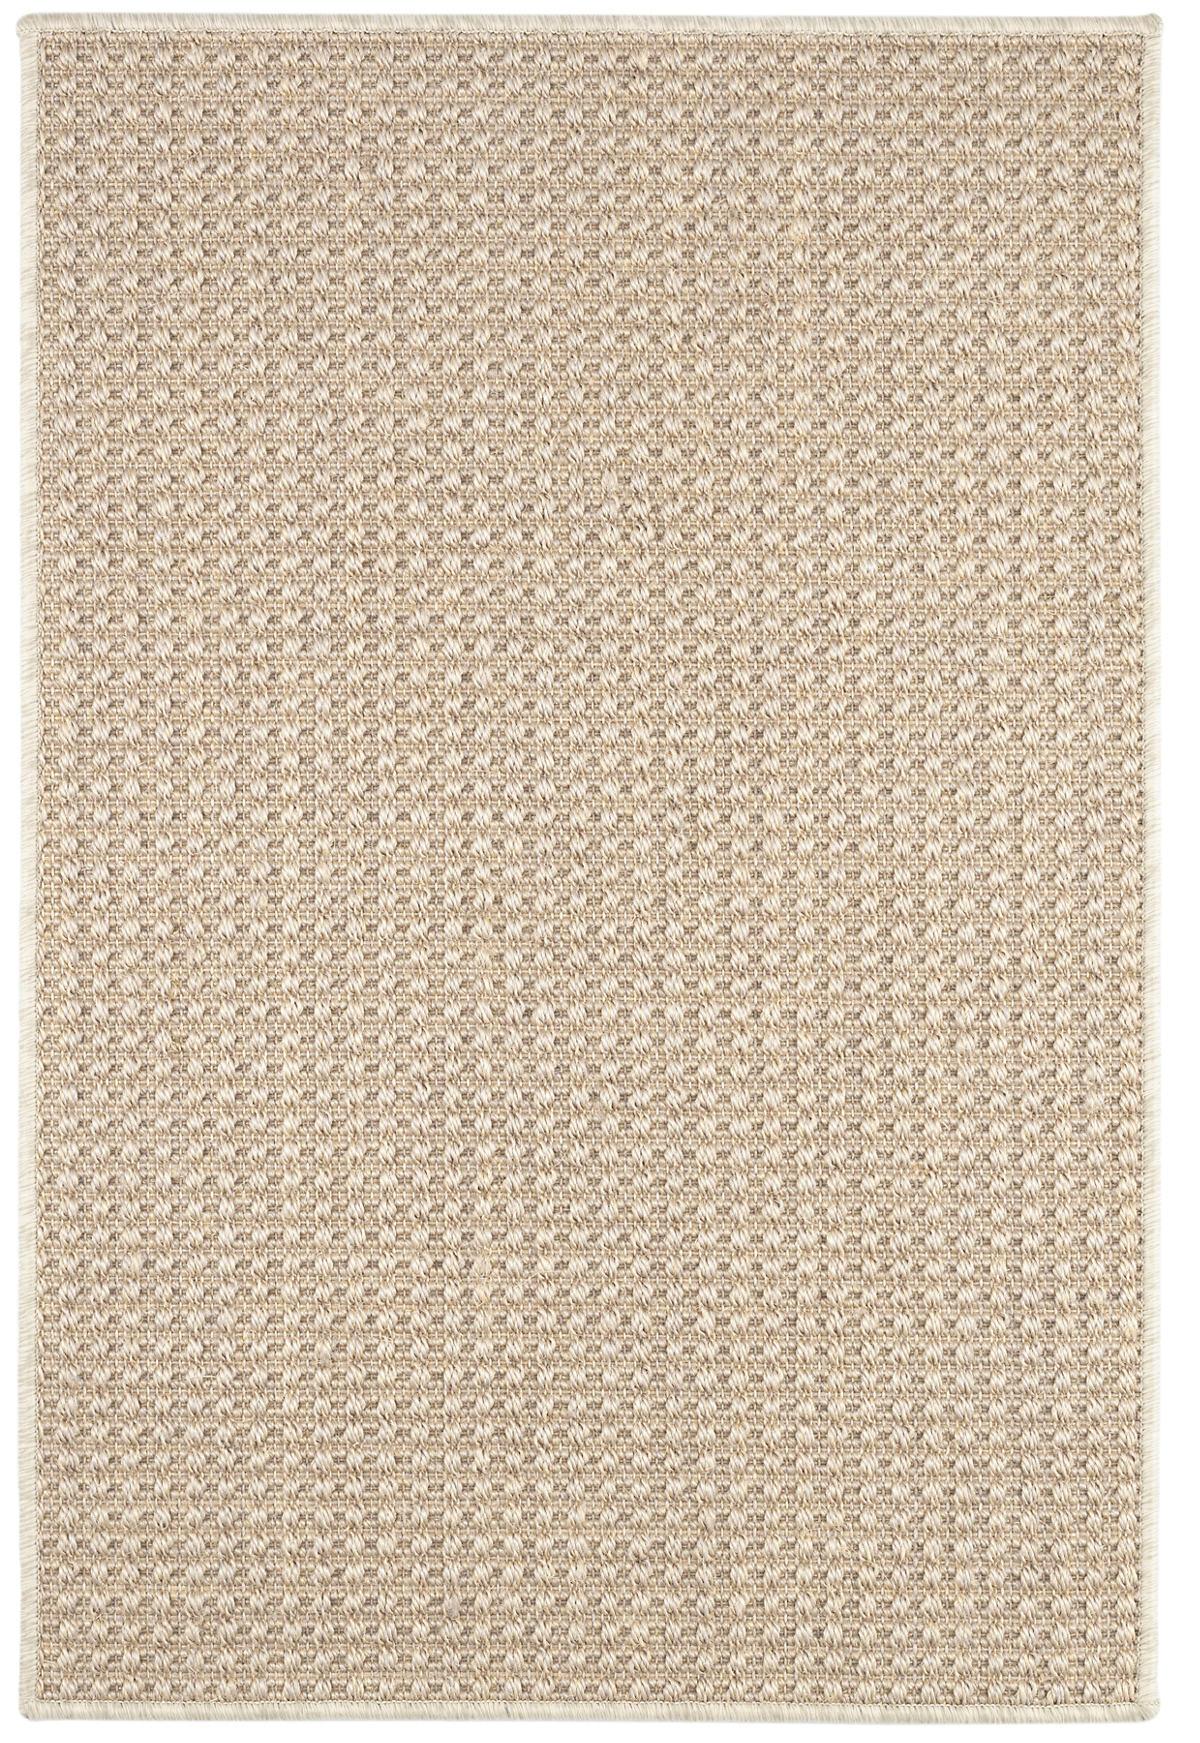 Ashburn Sand Woven Sisal Custom Rug